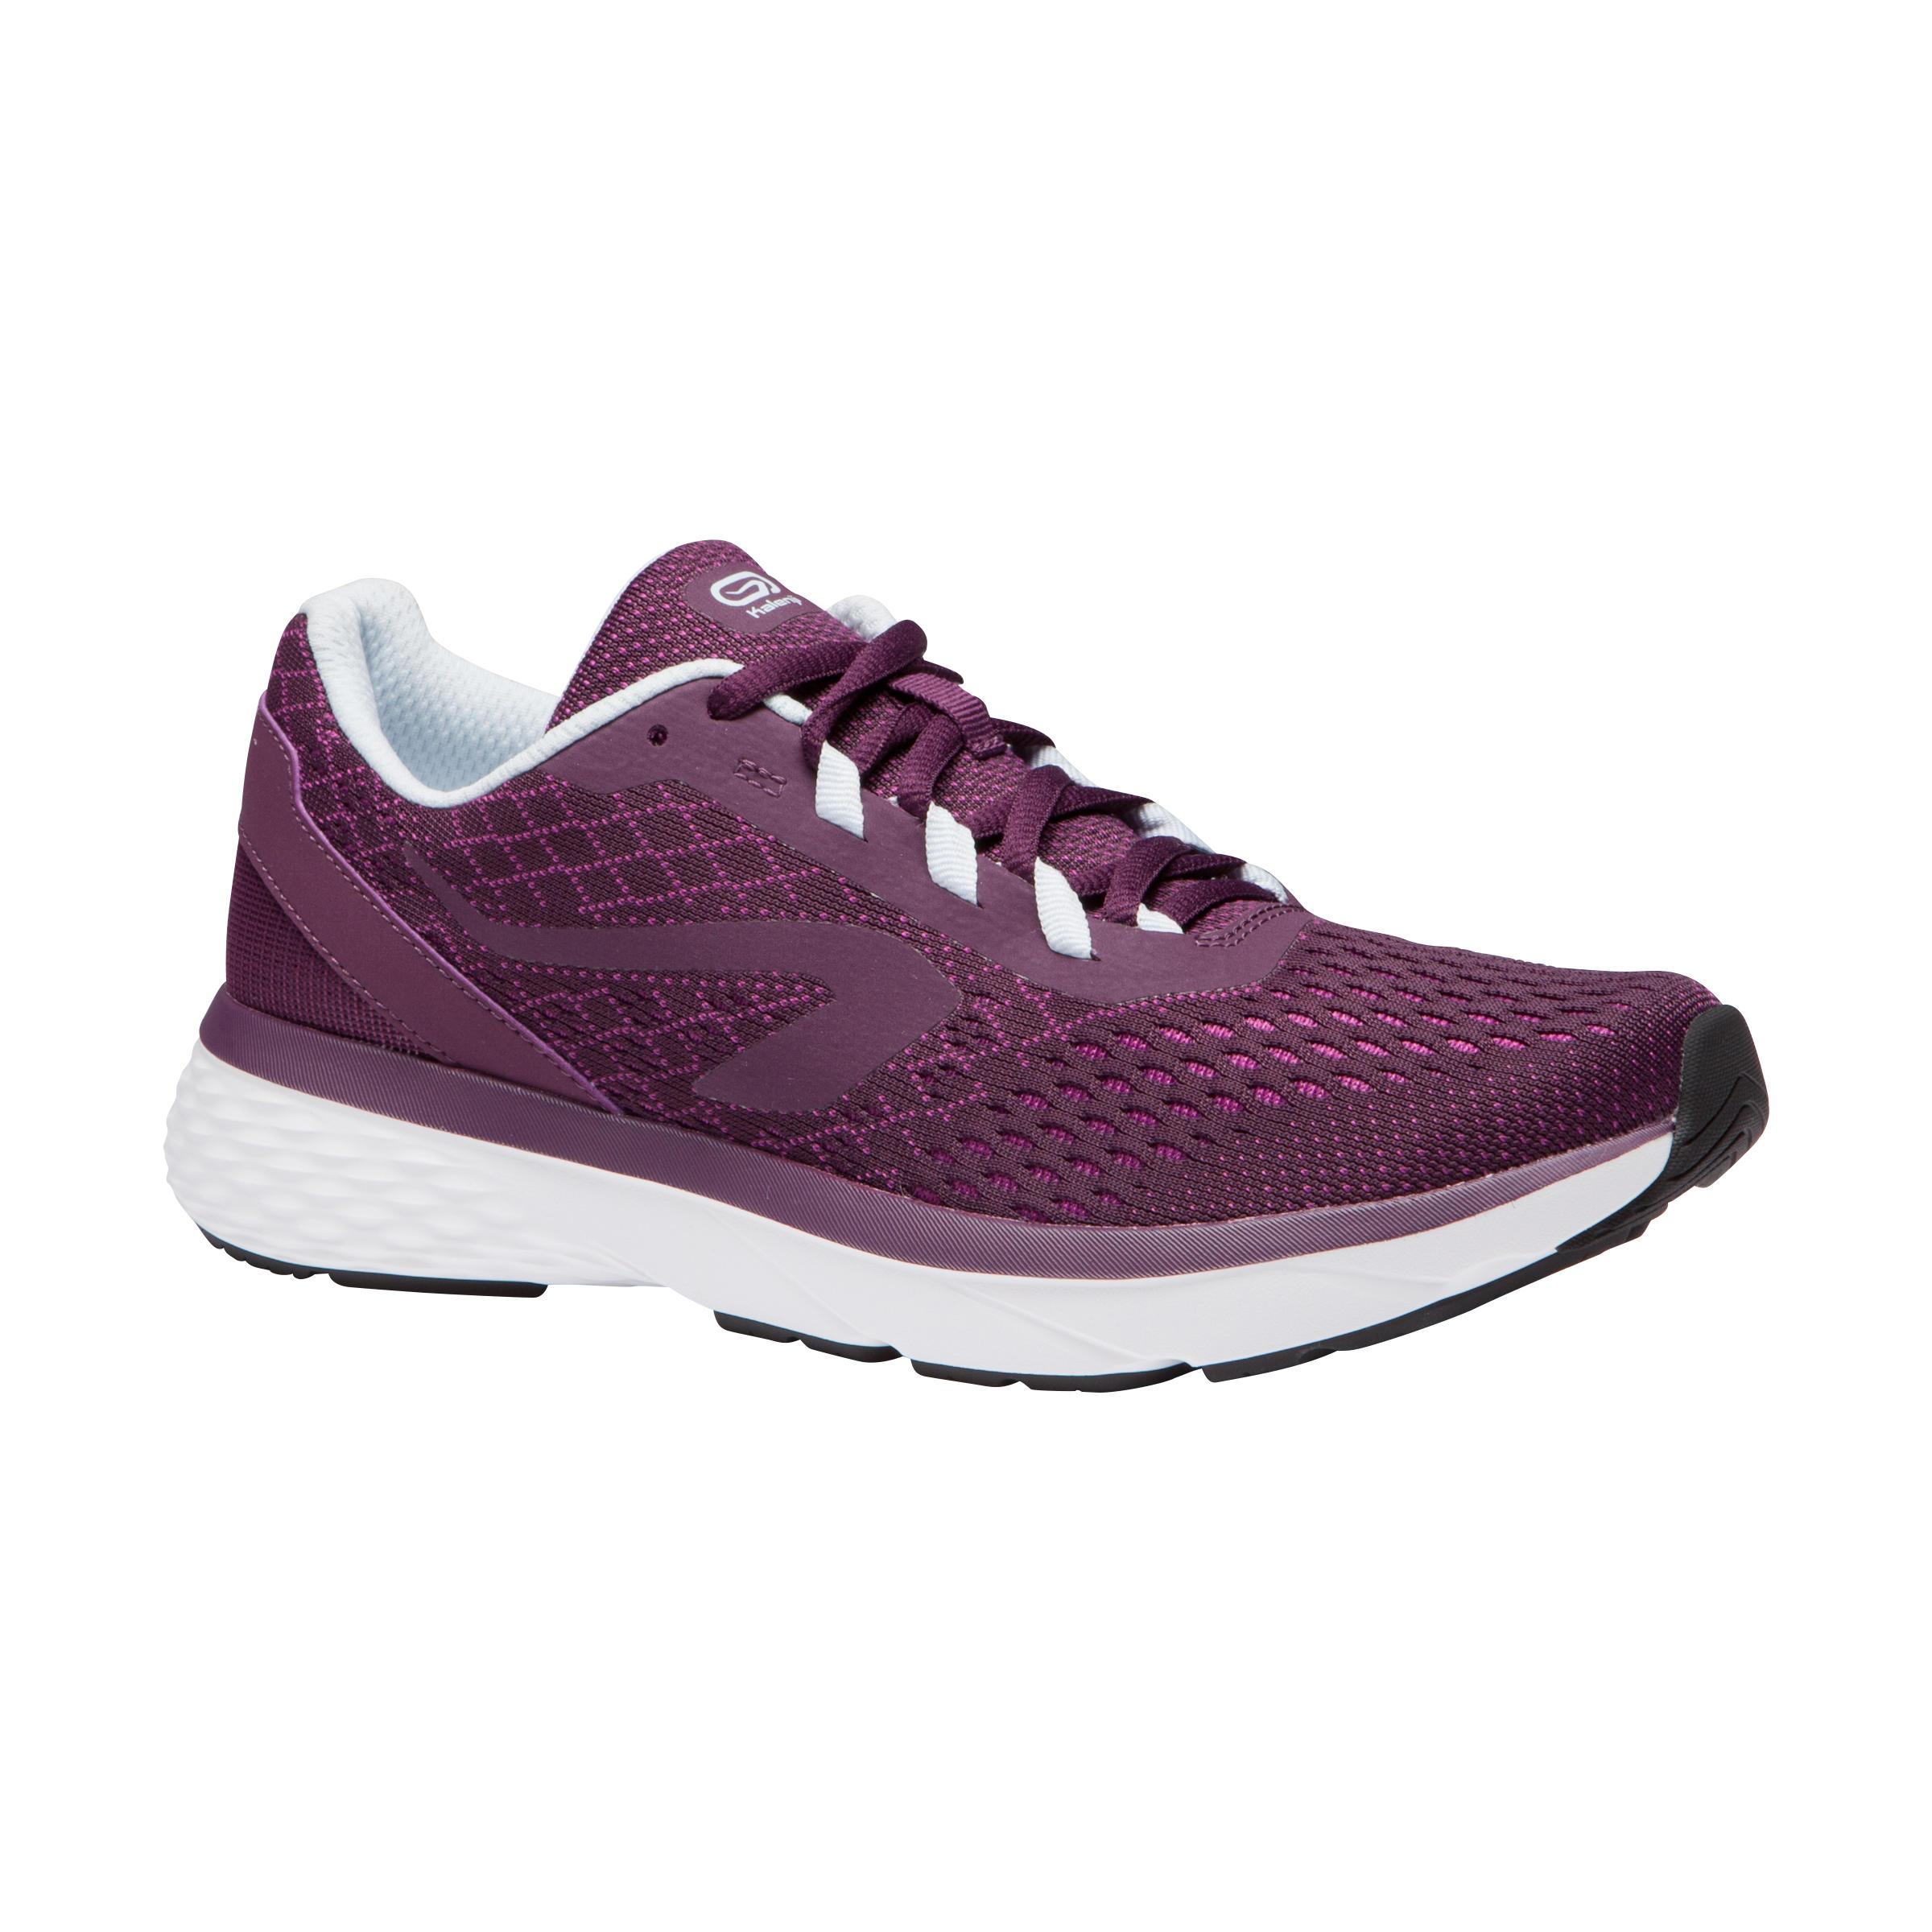 Nike Free Run 2 Männer purpul Dark Blue Outlet Online